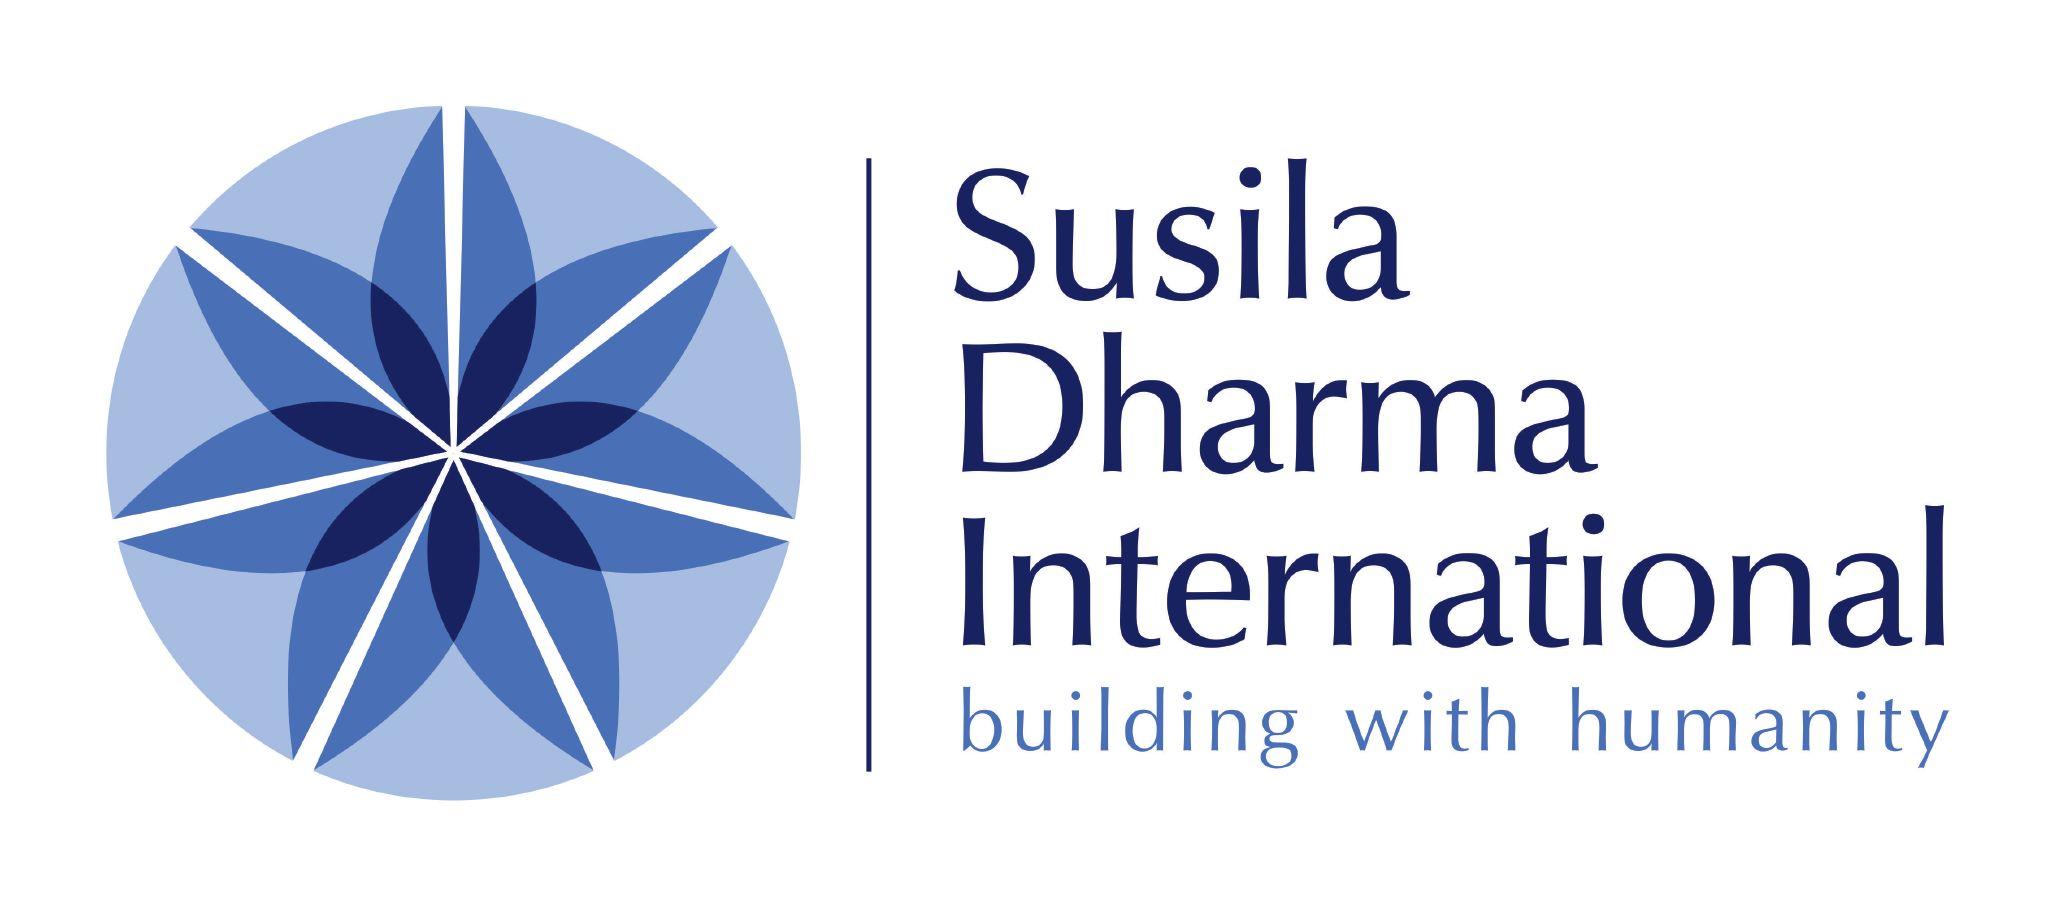 Susila Dharma